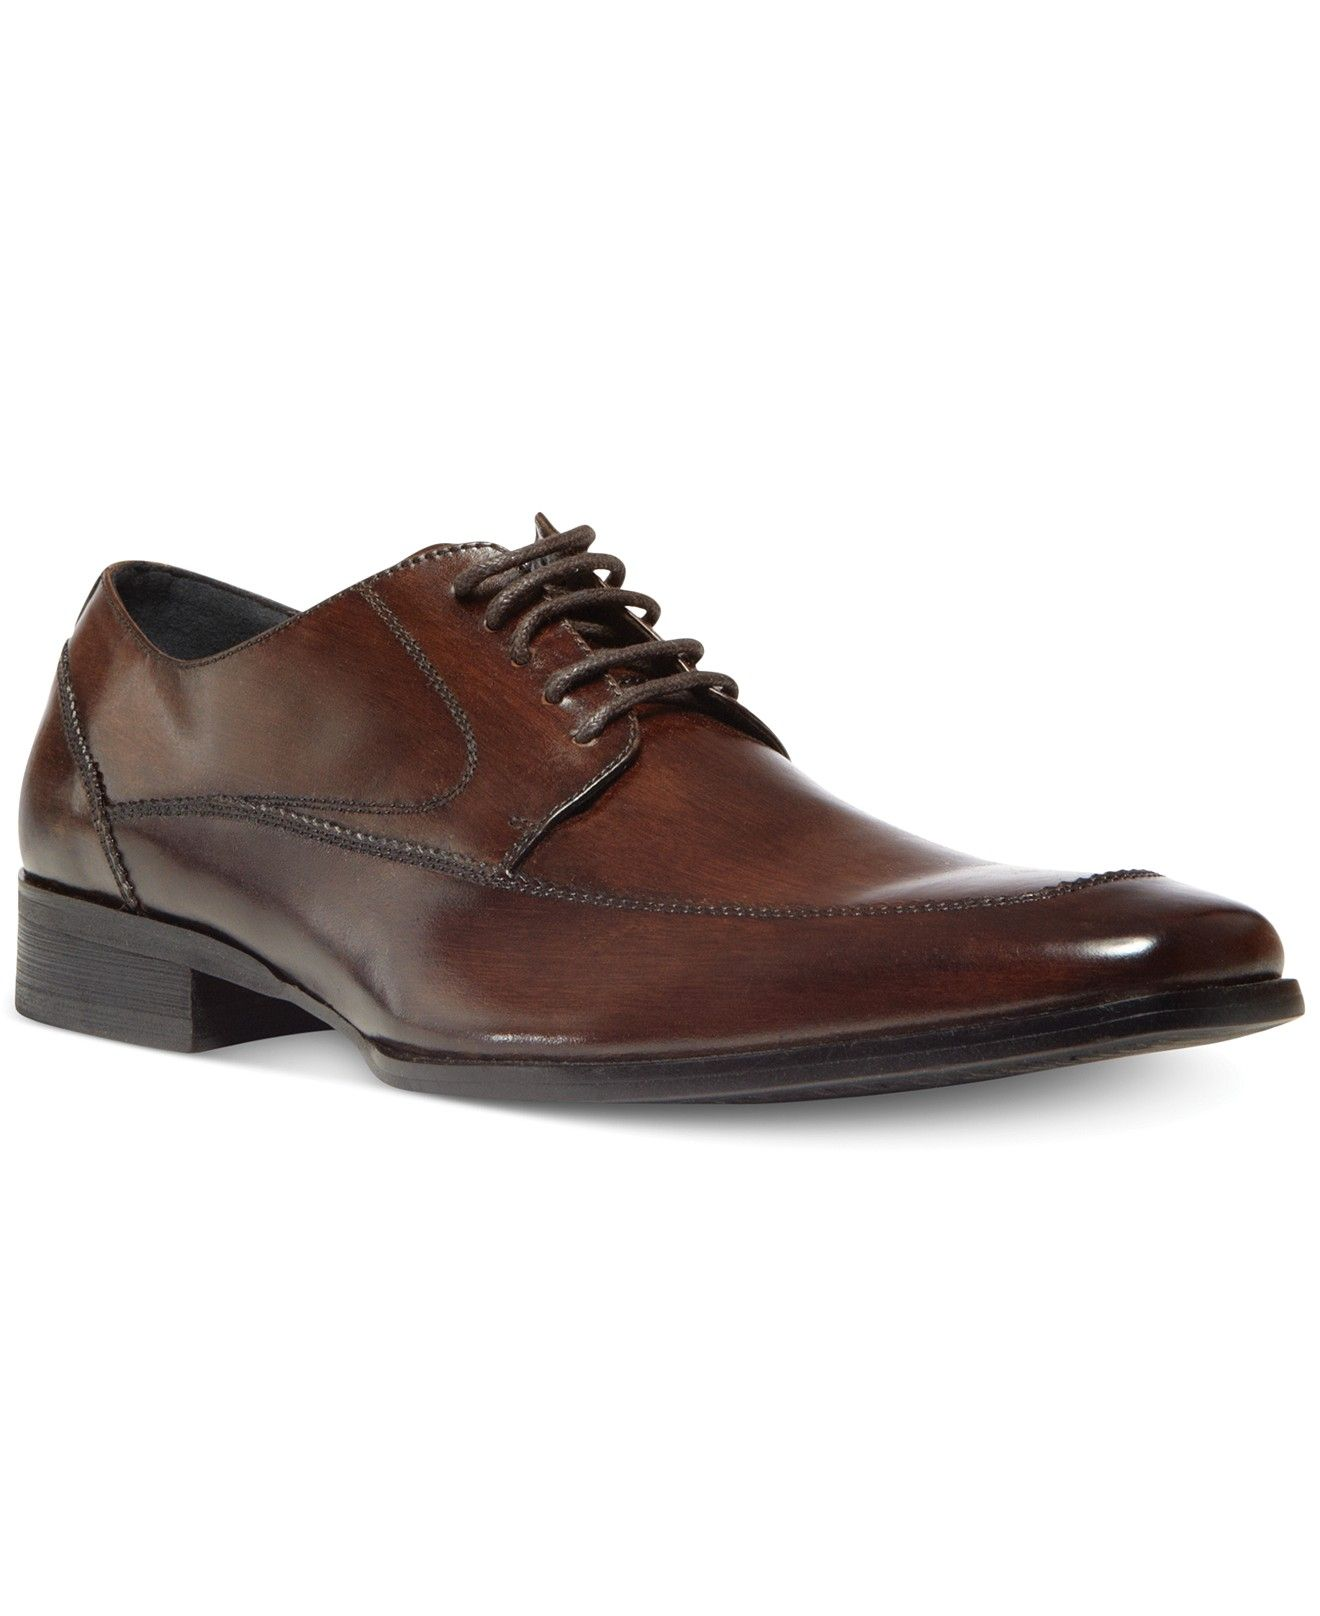 Steve Madden Sayge Lace-Up Dress Shoes - All Men's Shoes - Men - Macy's